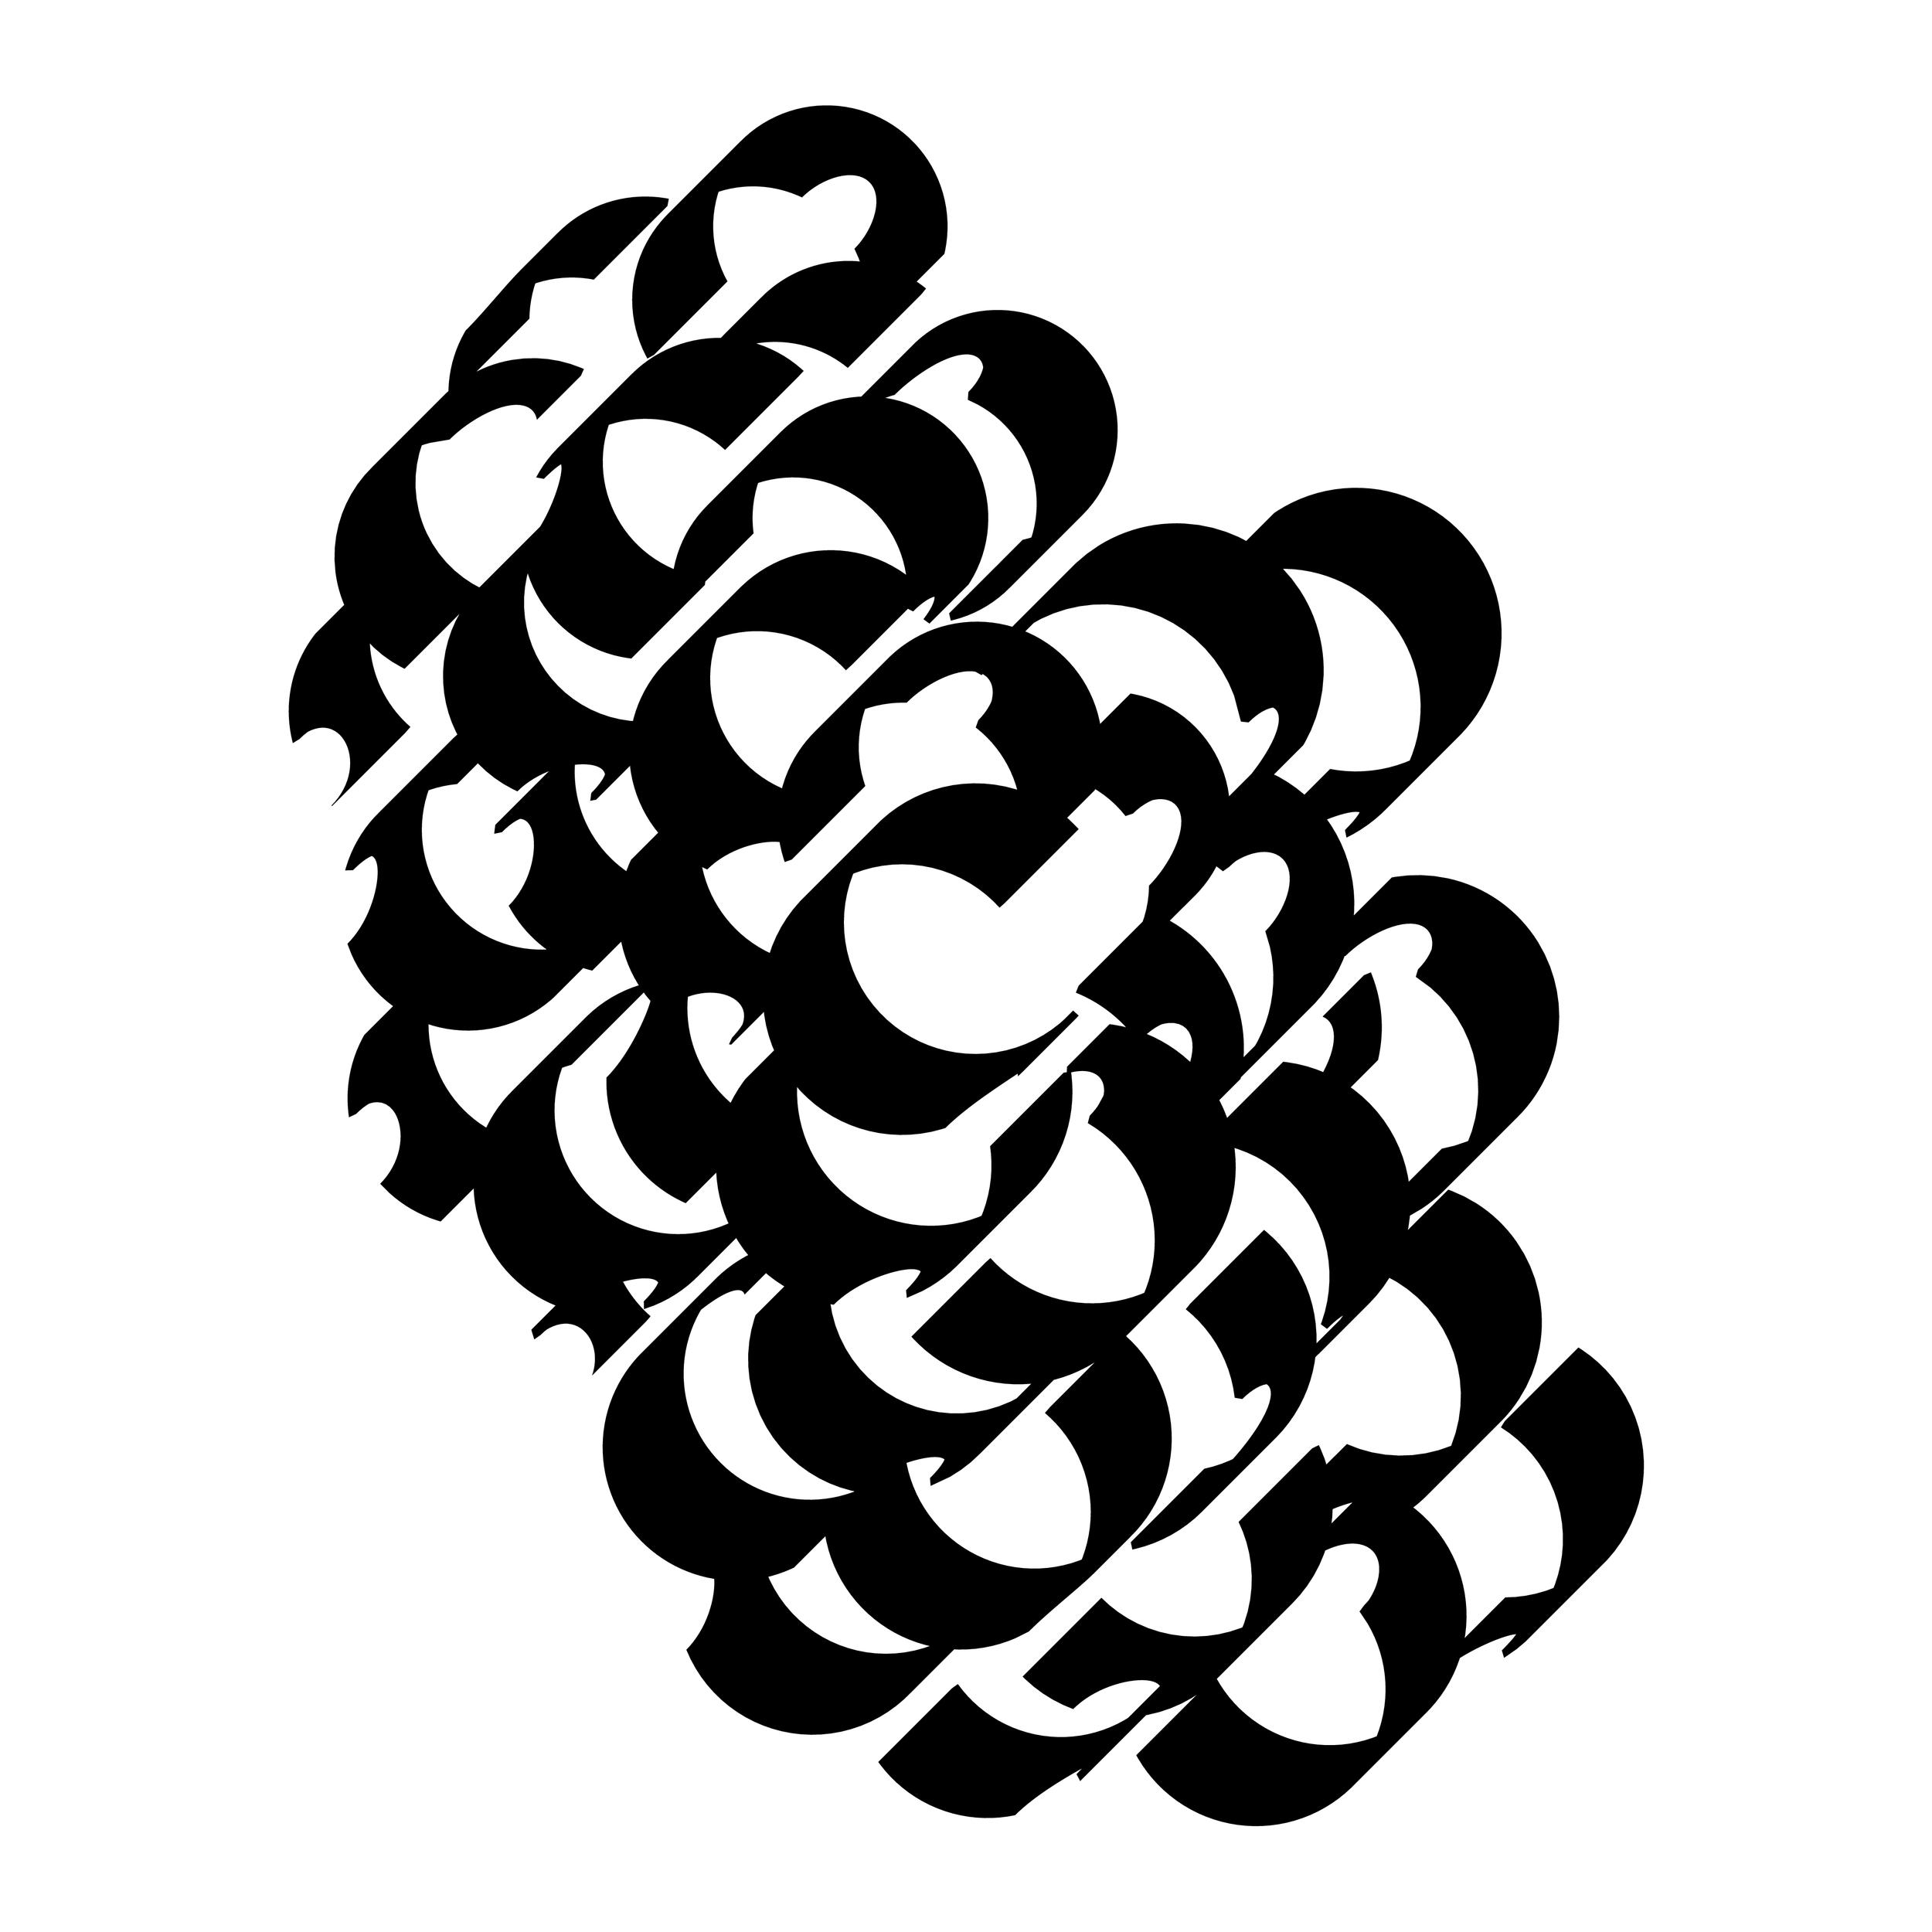 Circular Rooms, Seed 91